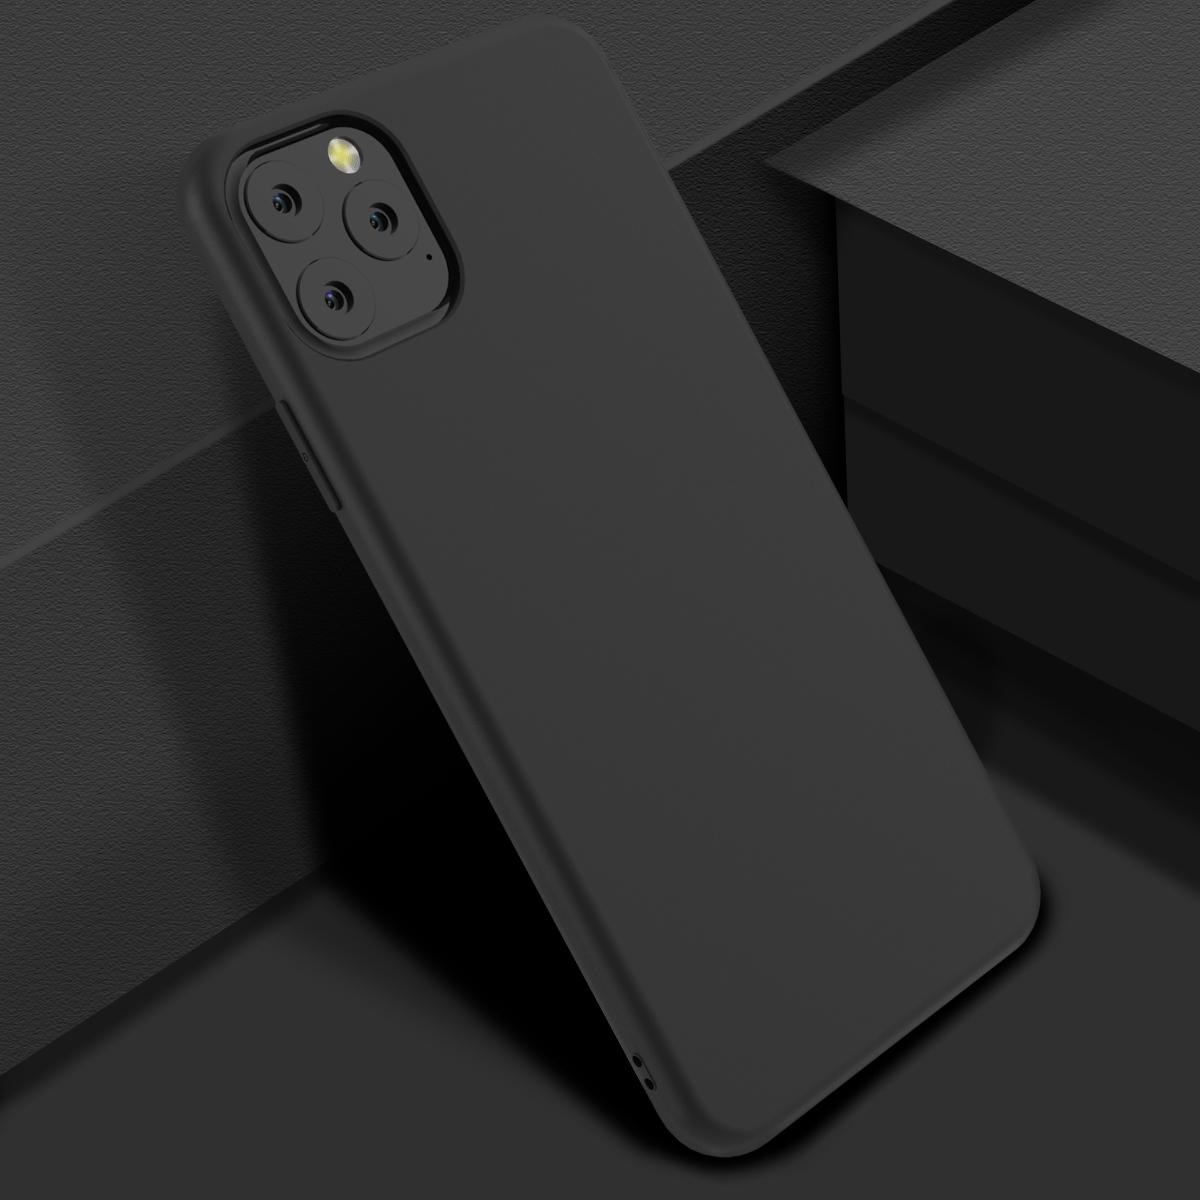 Torubia Silicone Case for iPhone 11/11 Pro/11 Pro Max 125